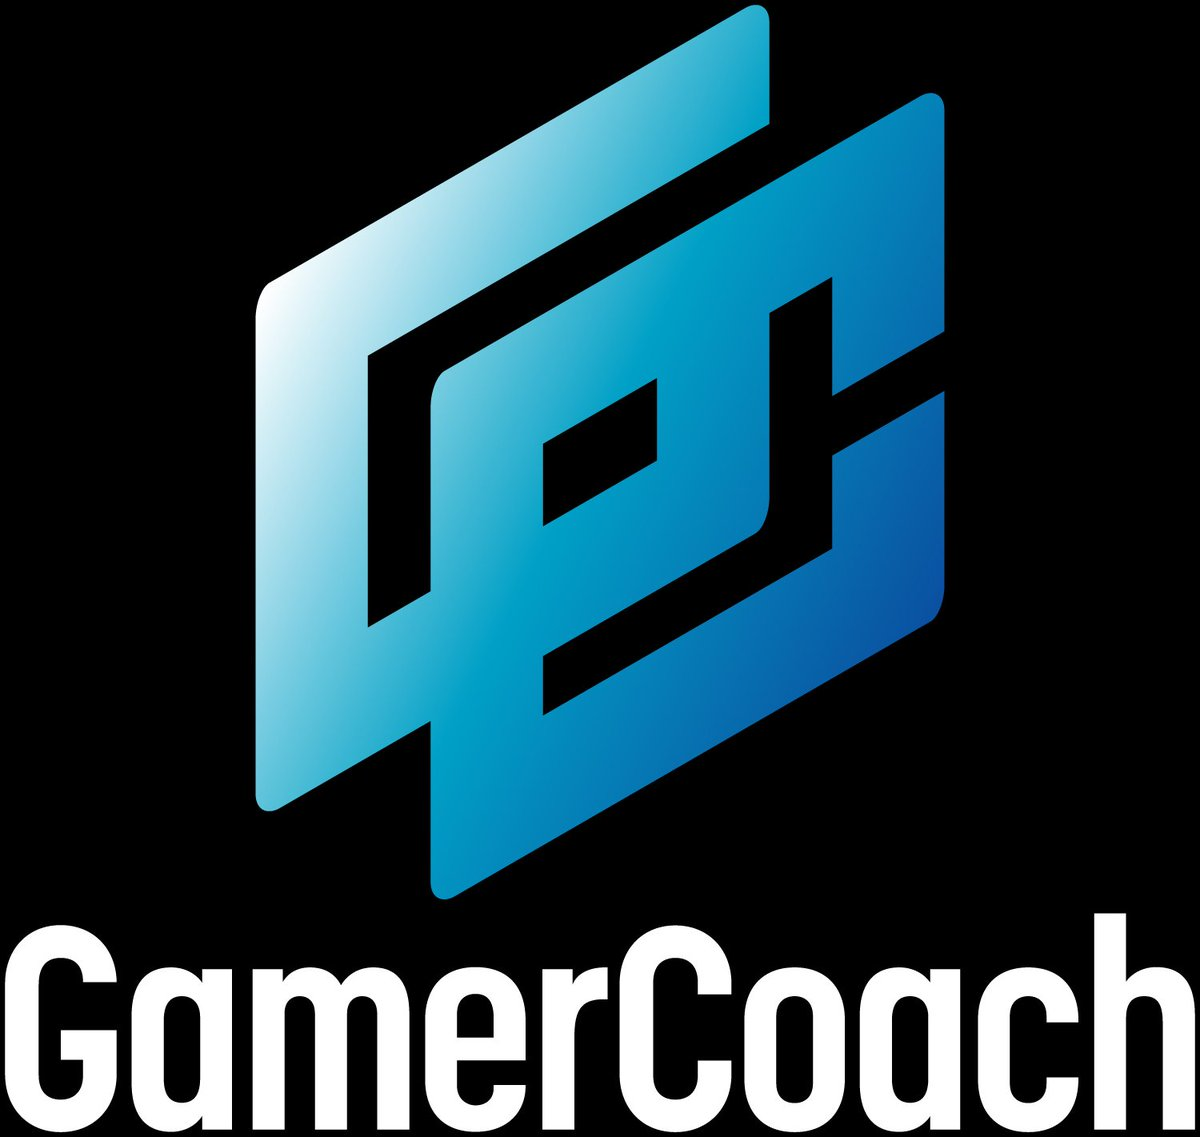 esportsコーチから指導を受けれる新サービス『GamerCoach』を新規リリース https://t.co/c42gsAeqmT